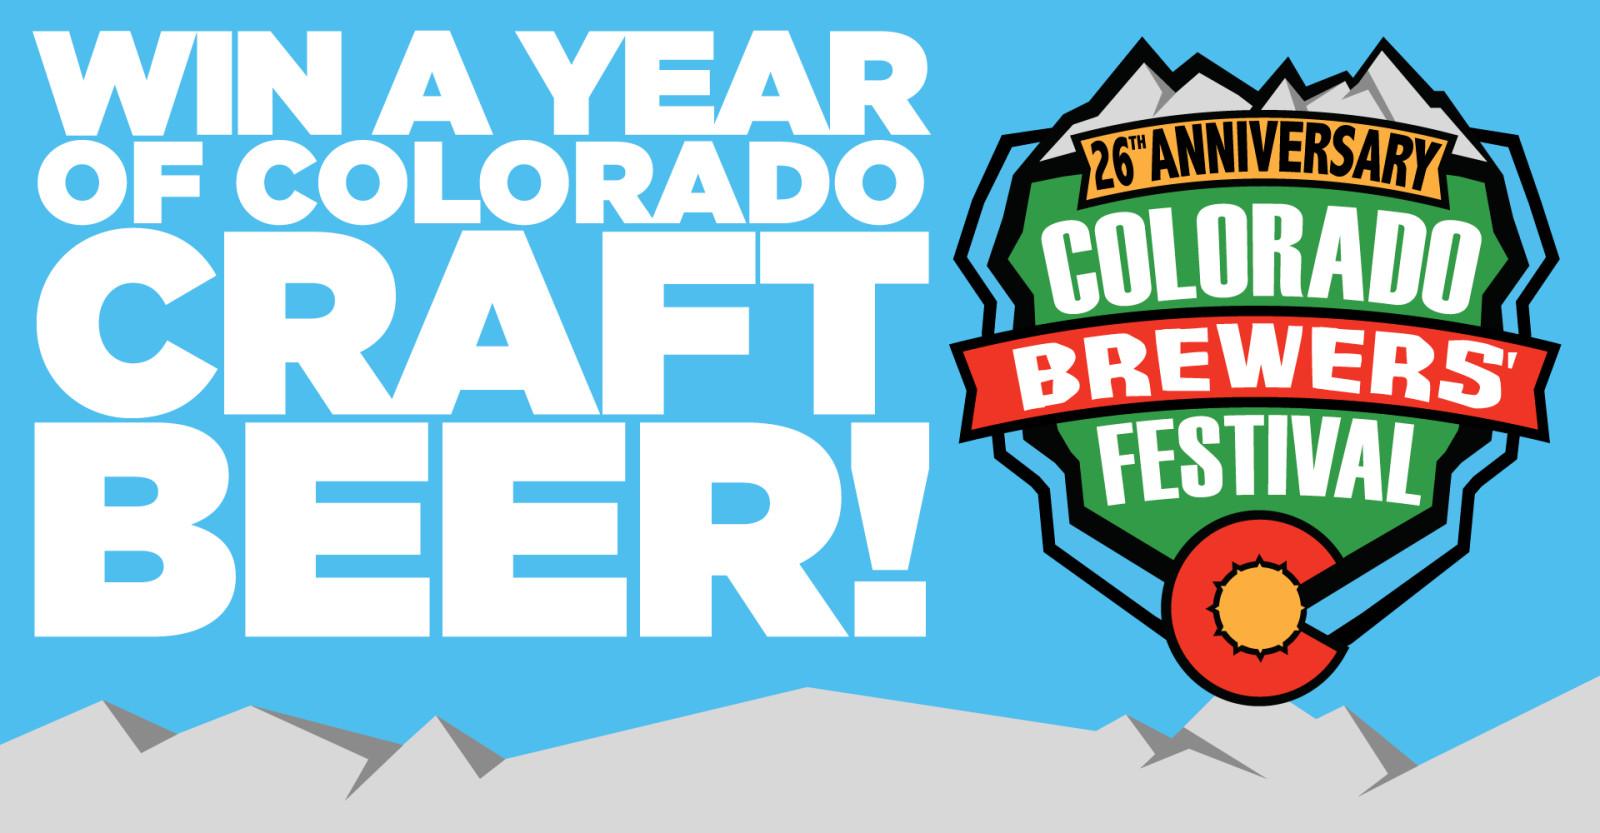 WIN A YEAR OF COLORADO CRAFT BEER | Craft Beer & Brewing